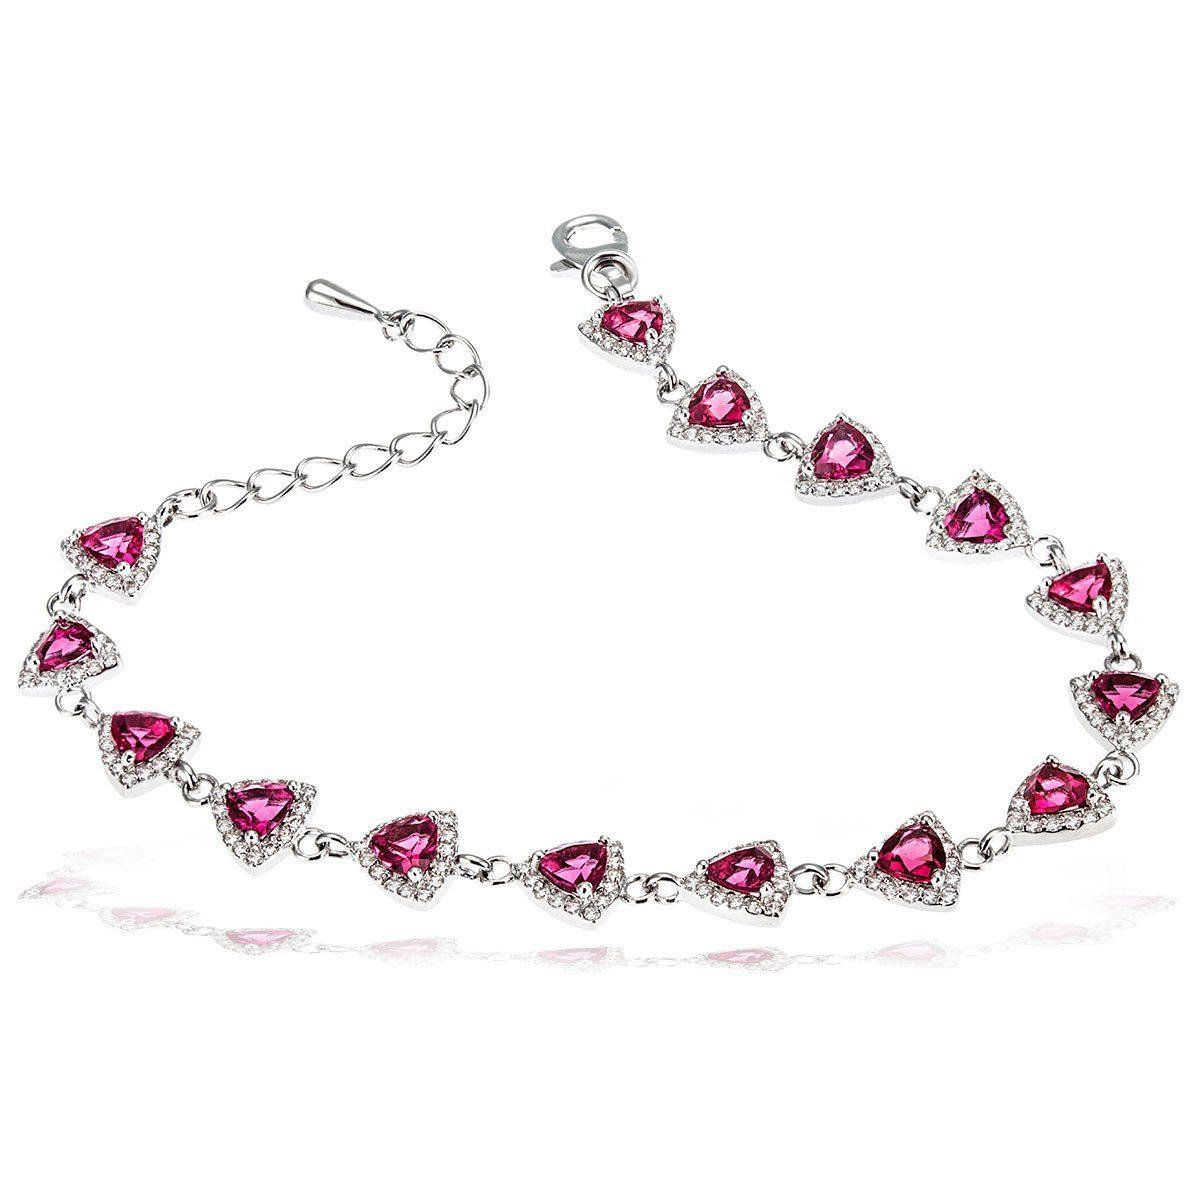 goldmaid Damenarmband 925 Silber mit pinkfarbenen Zirkonia